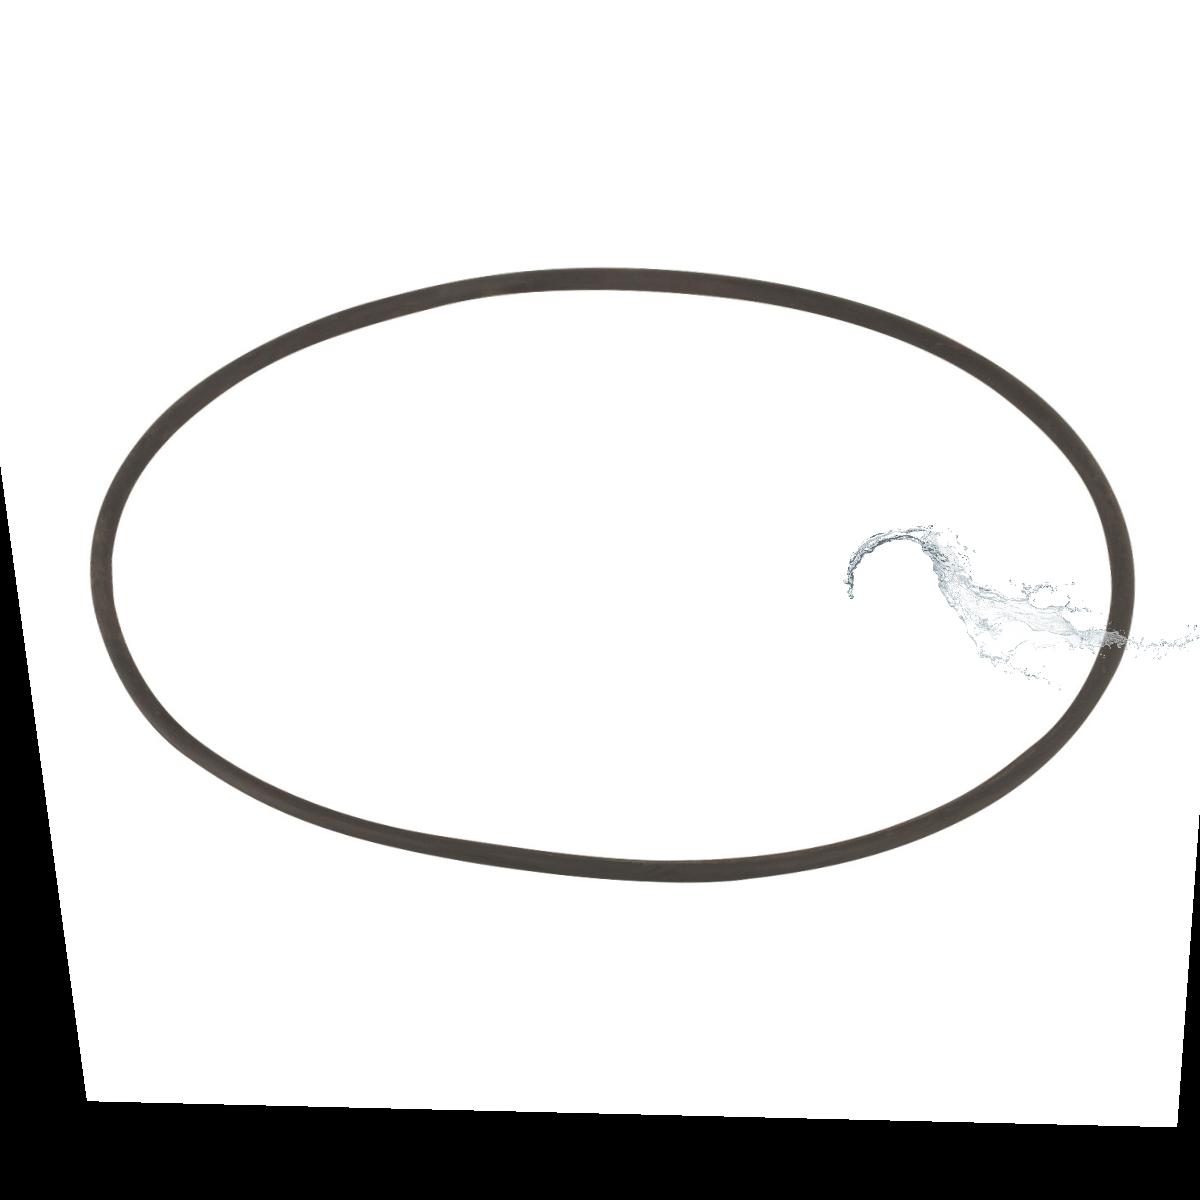 Уплотнительное кольцо дифузора Emaux крана MPV-05 2011016